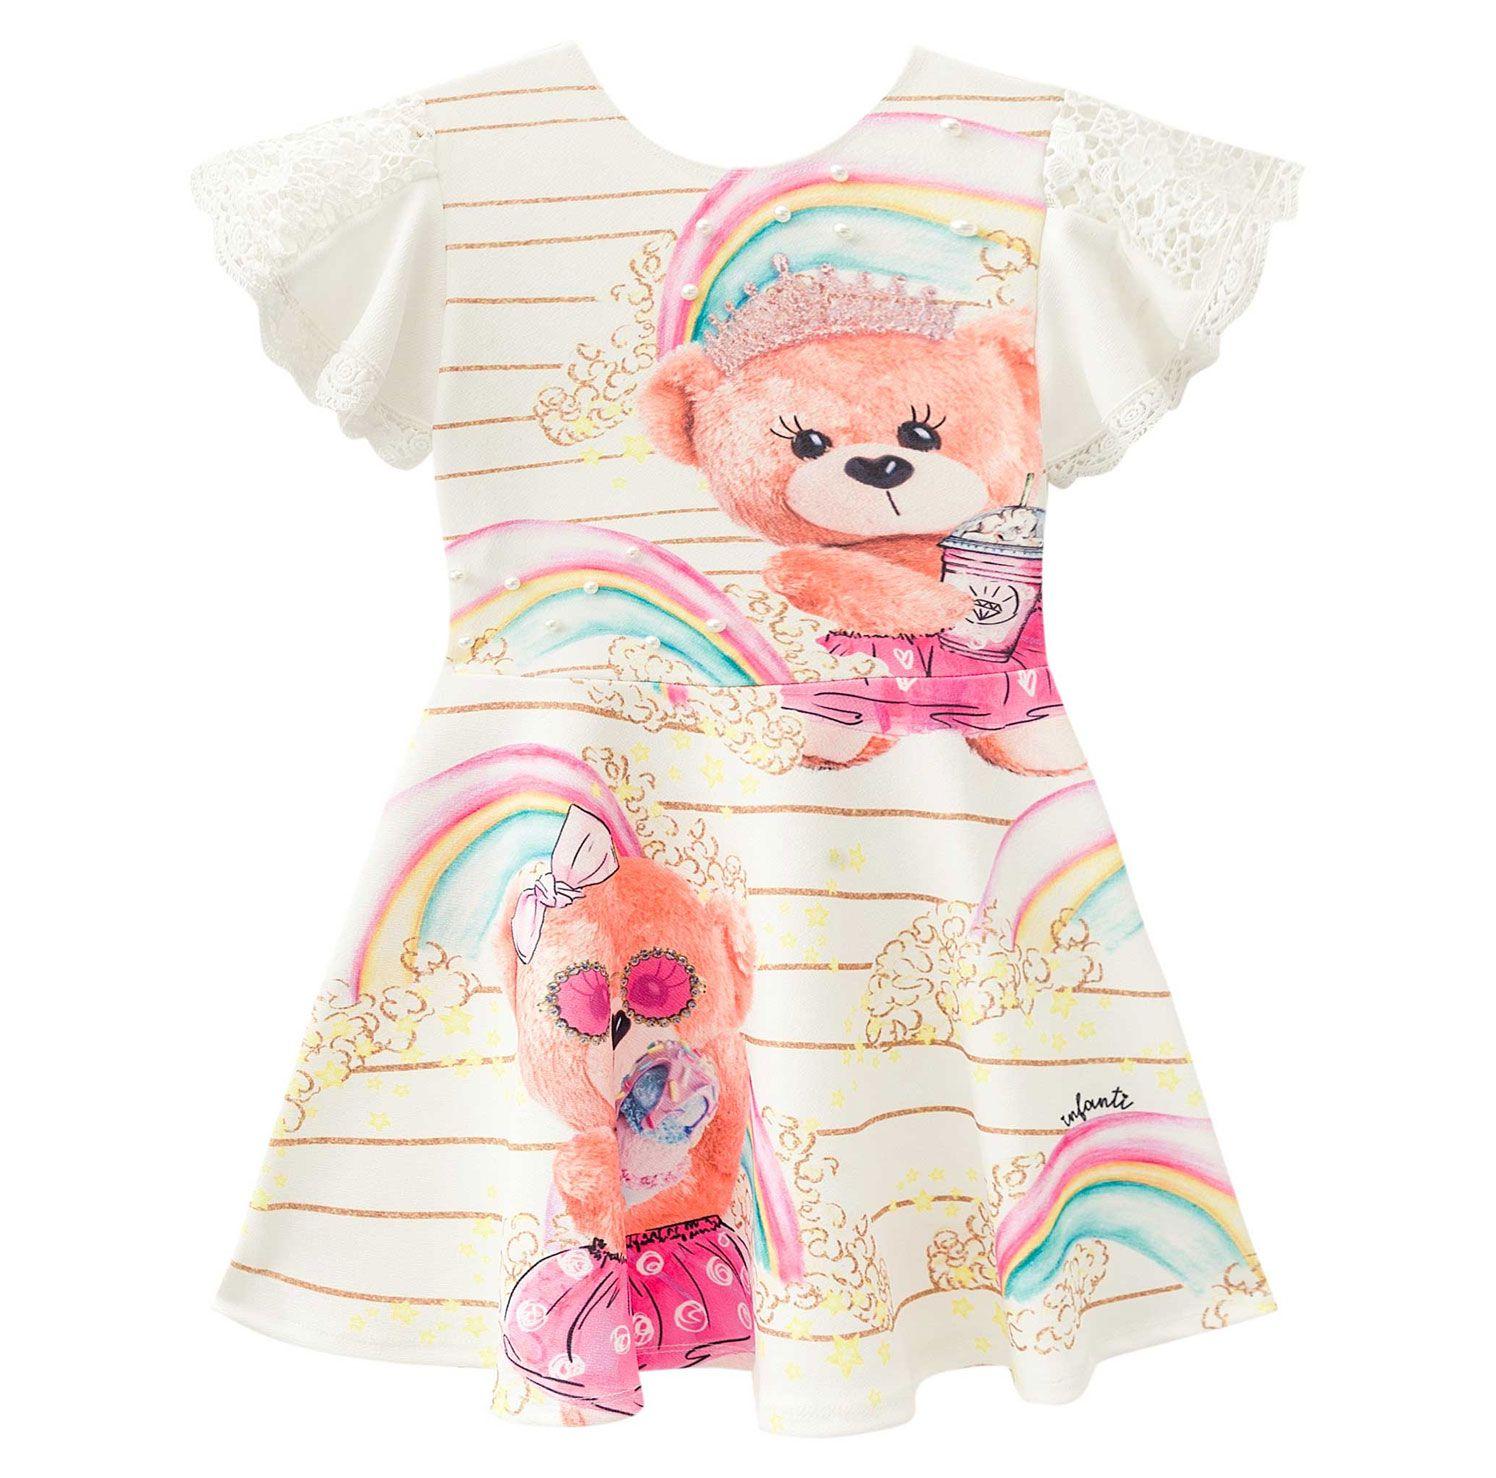 VESTIDO MANGA CURTA INFANTI REF:38854 2/4